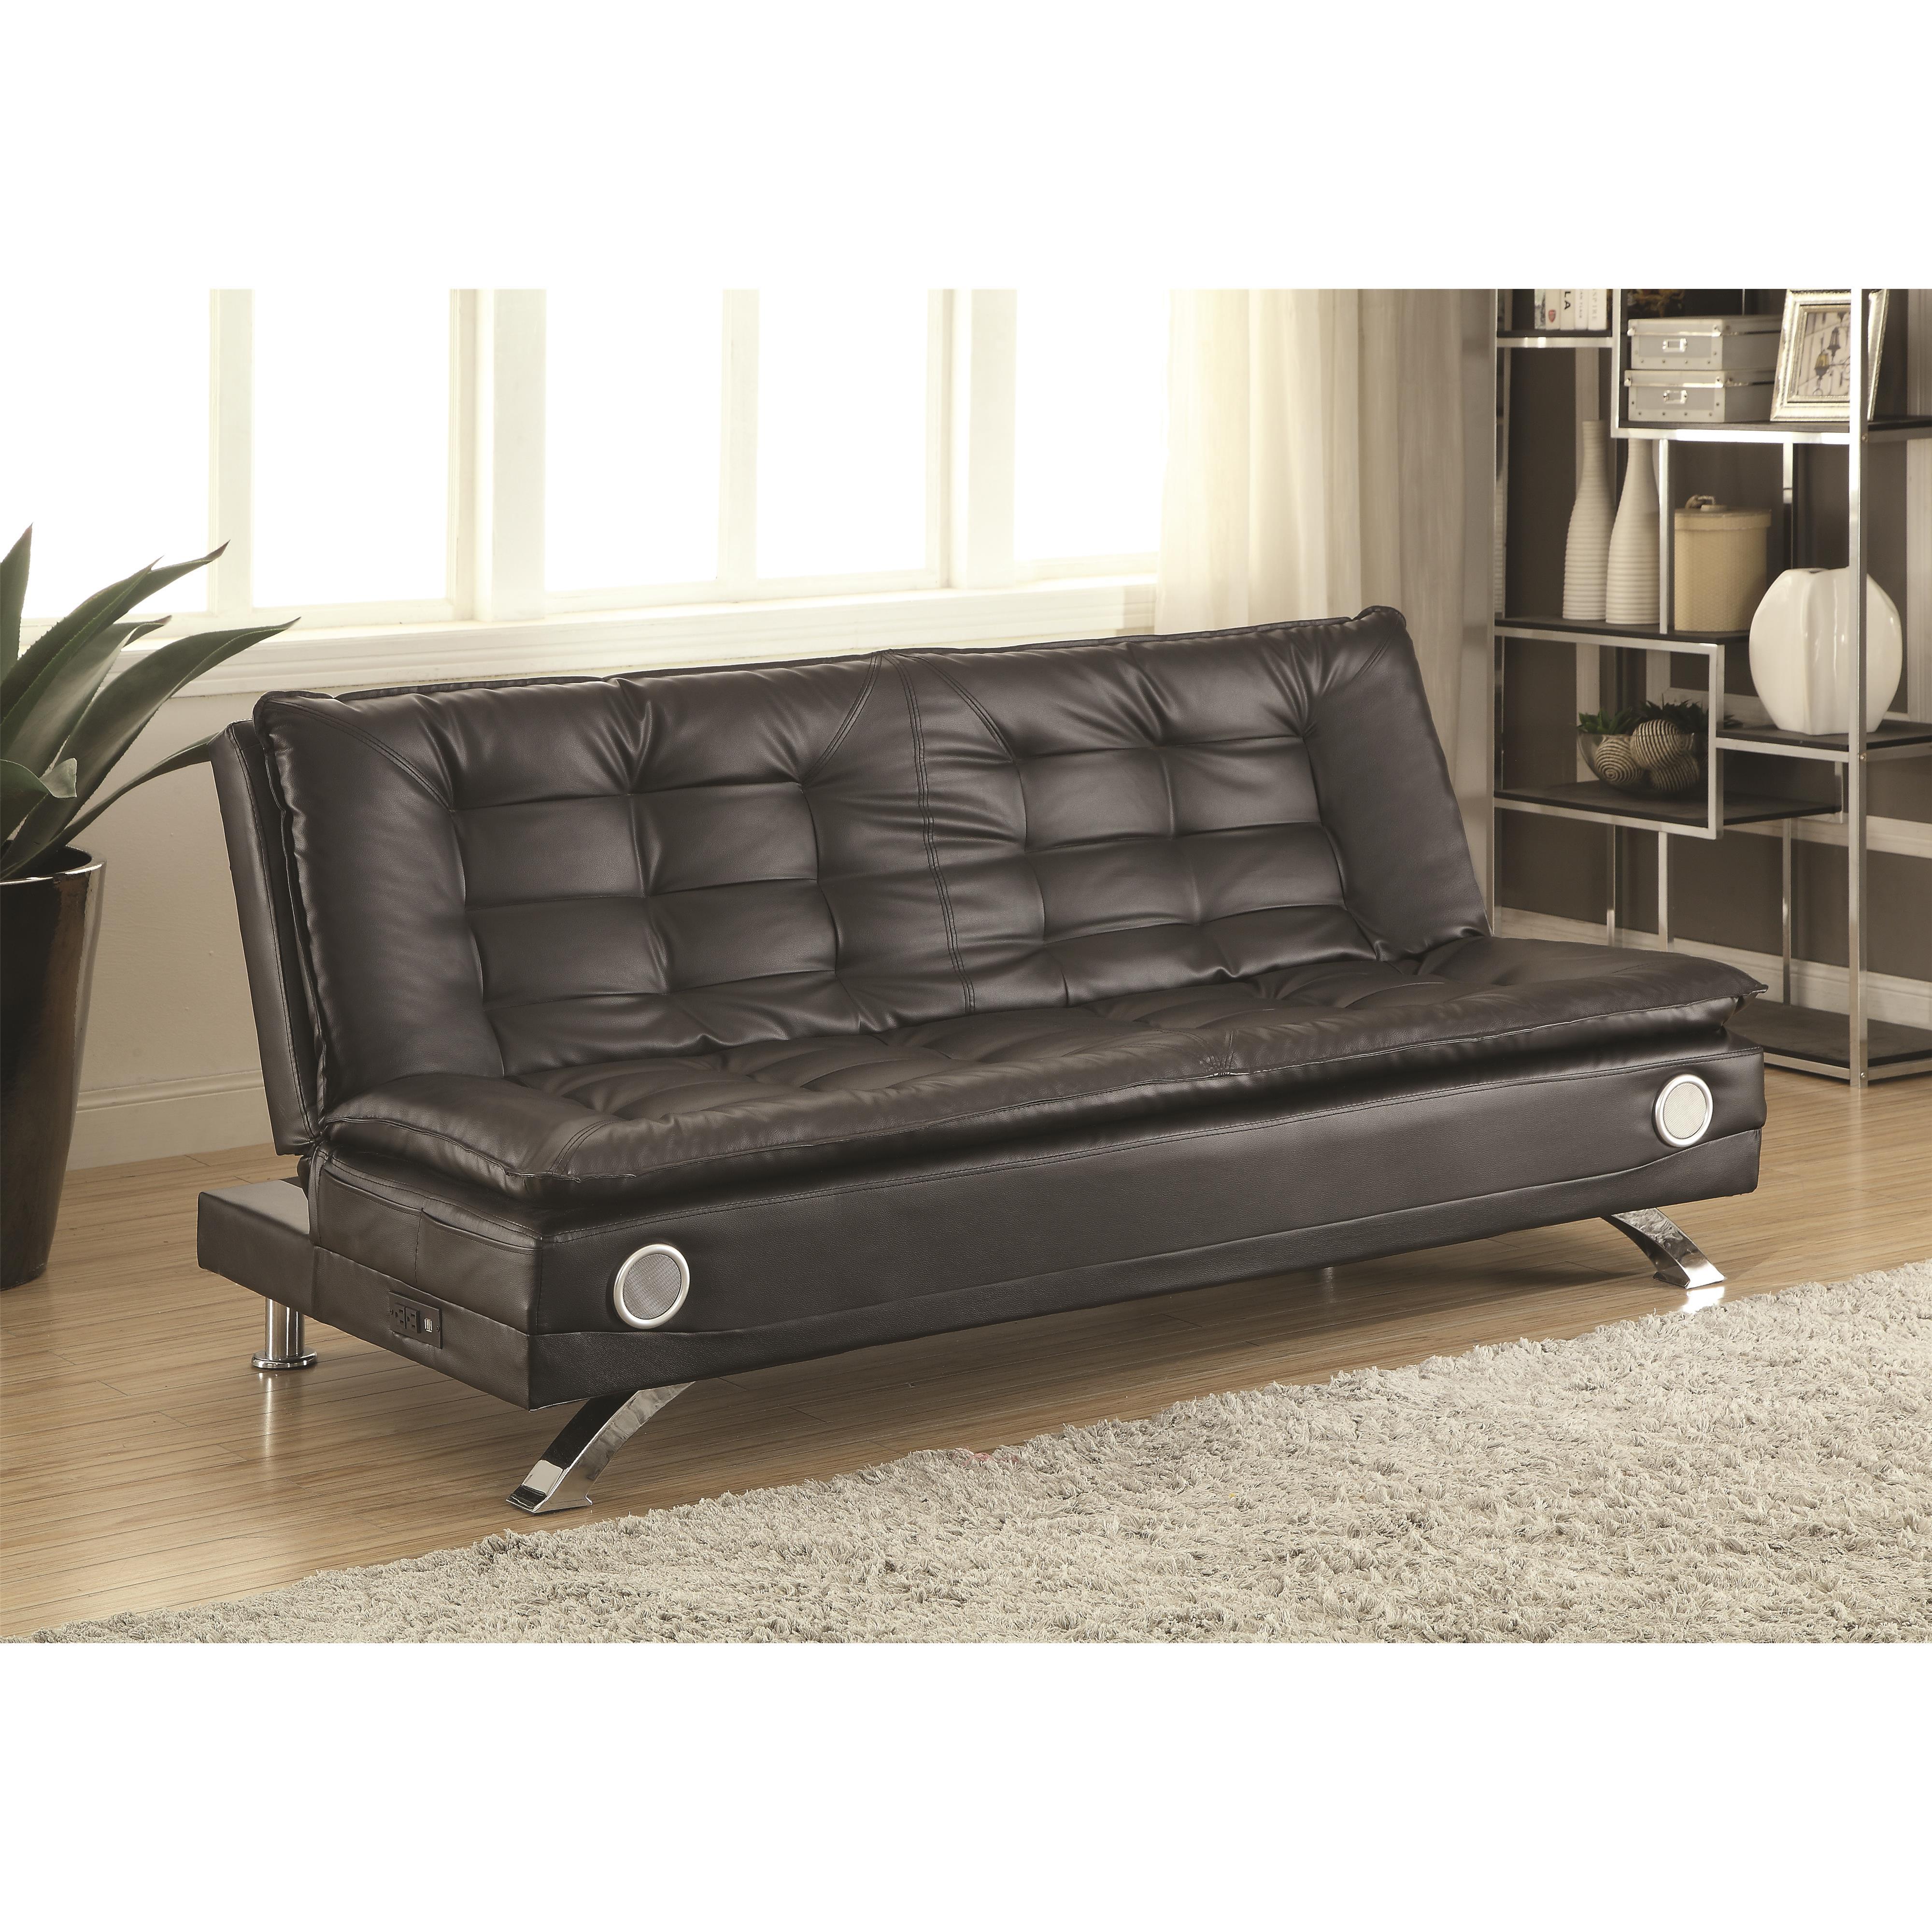 Coaster Erickson Sofa Bed - Item Number: 508061